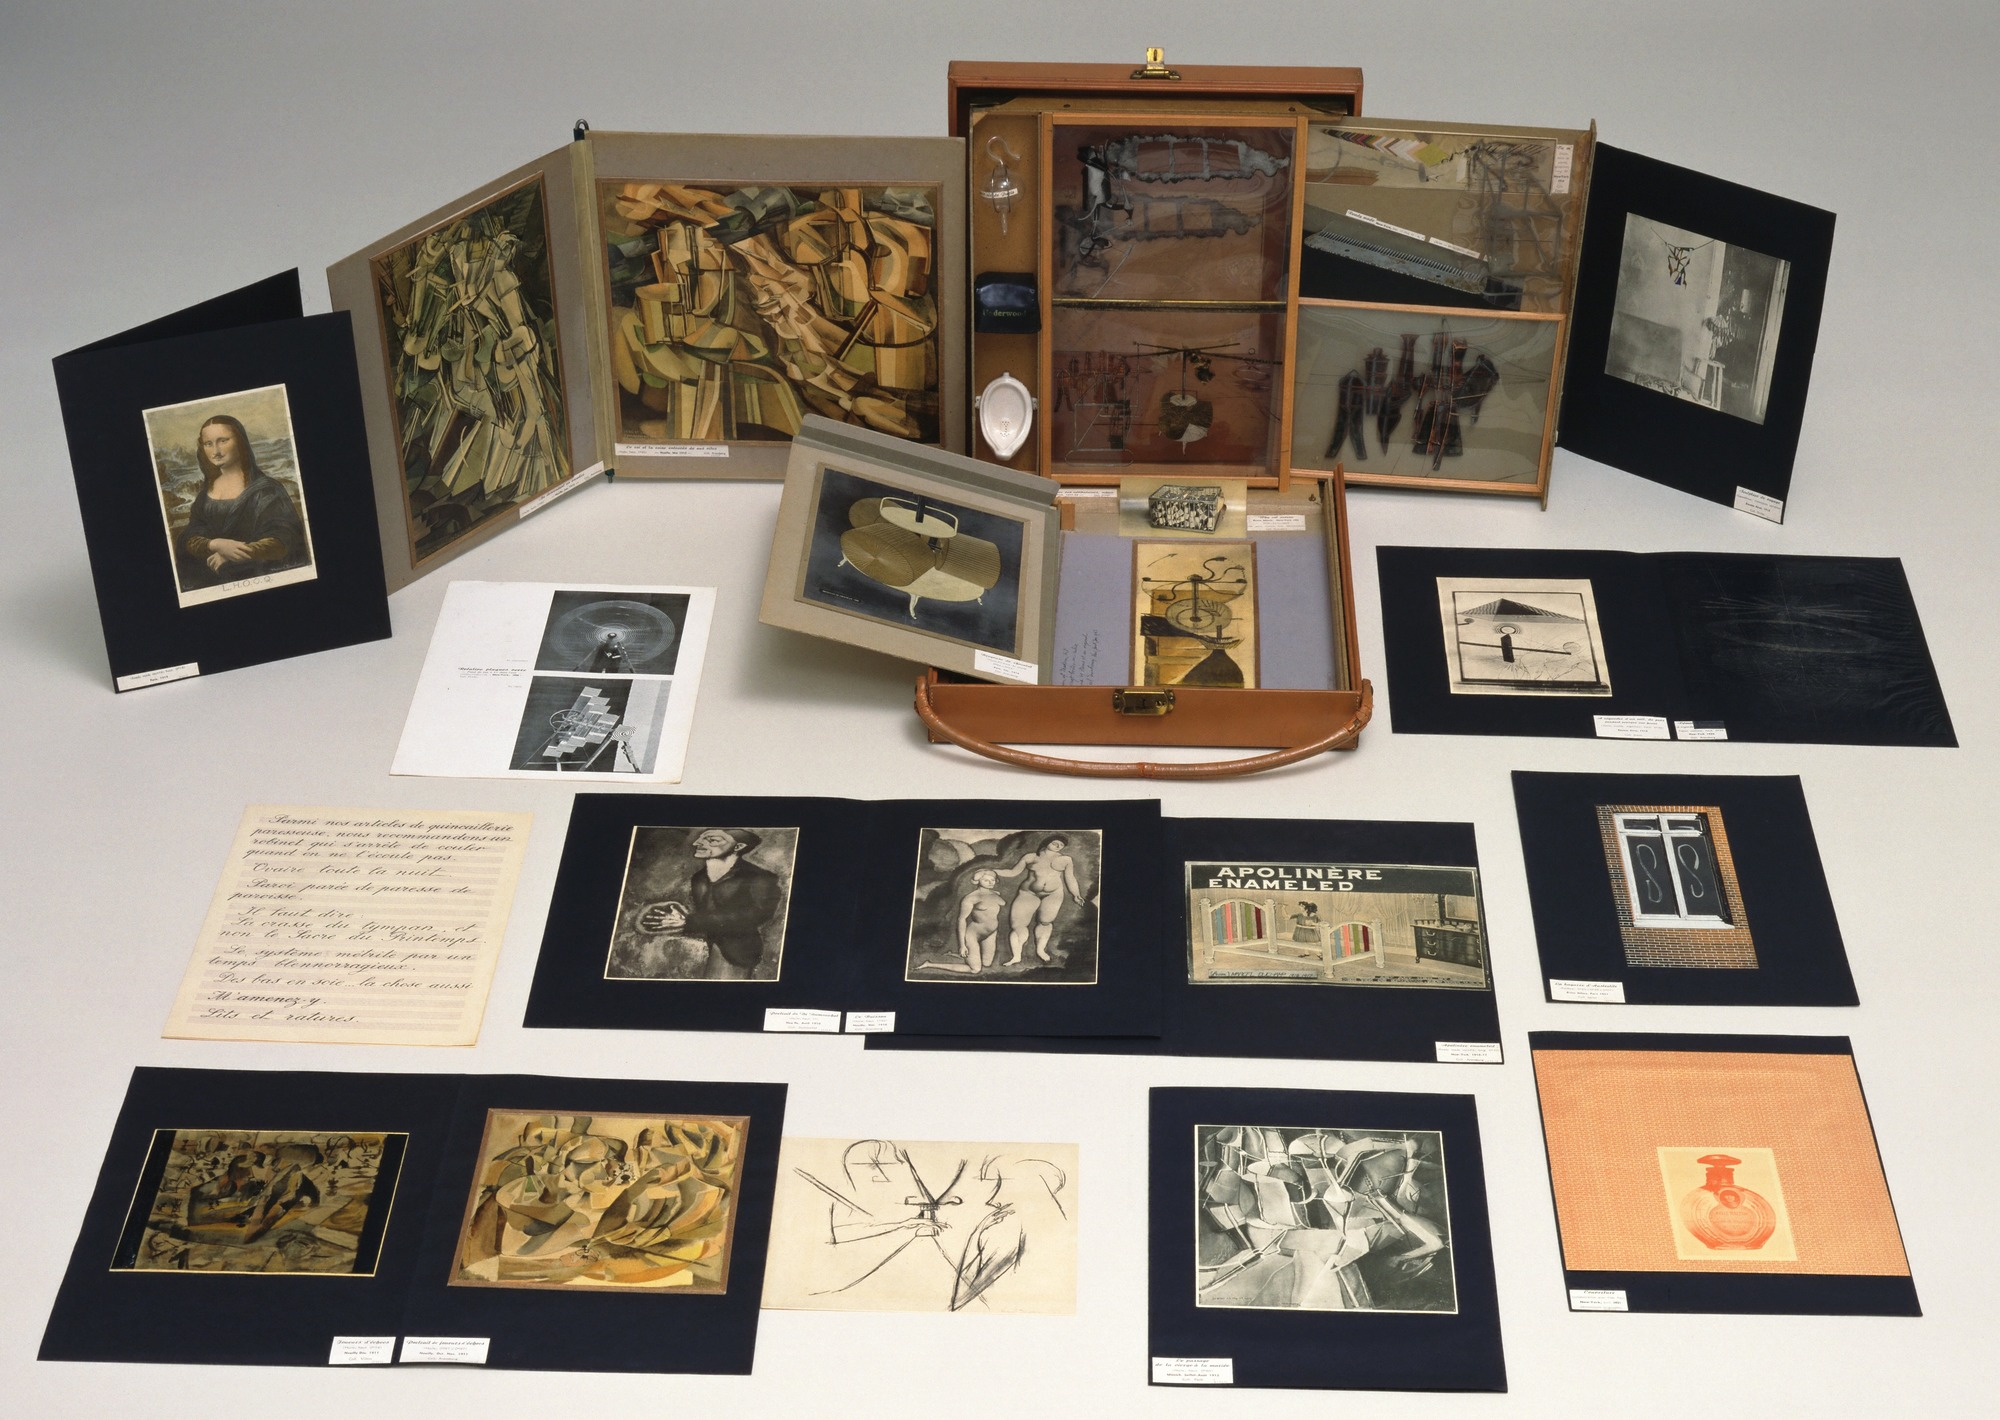 Marcel Duchamp's Box in a Valise